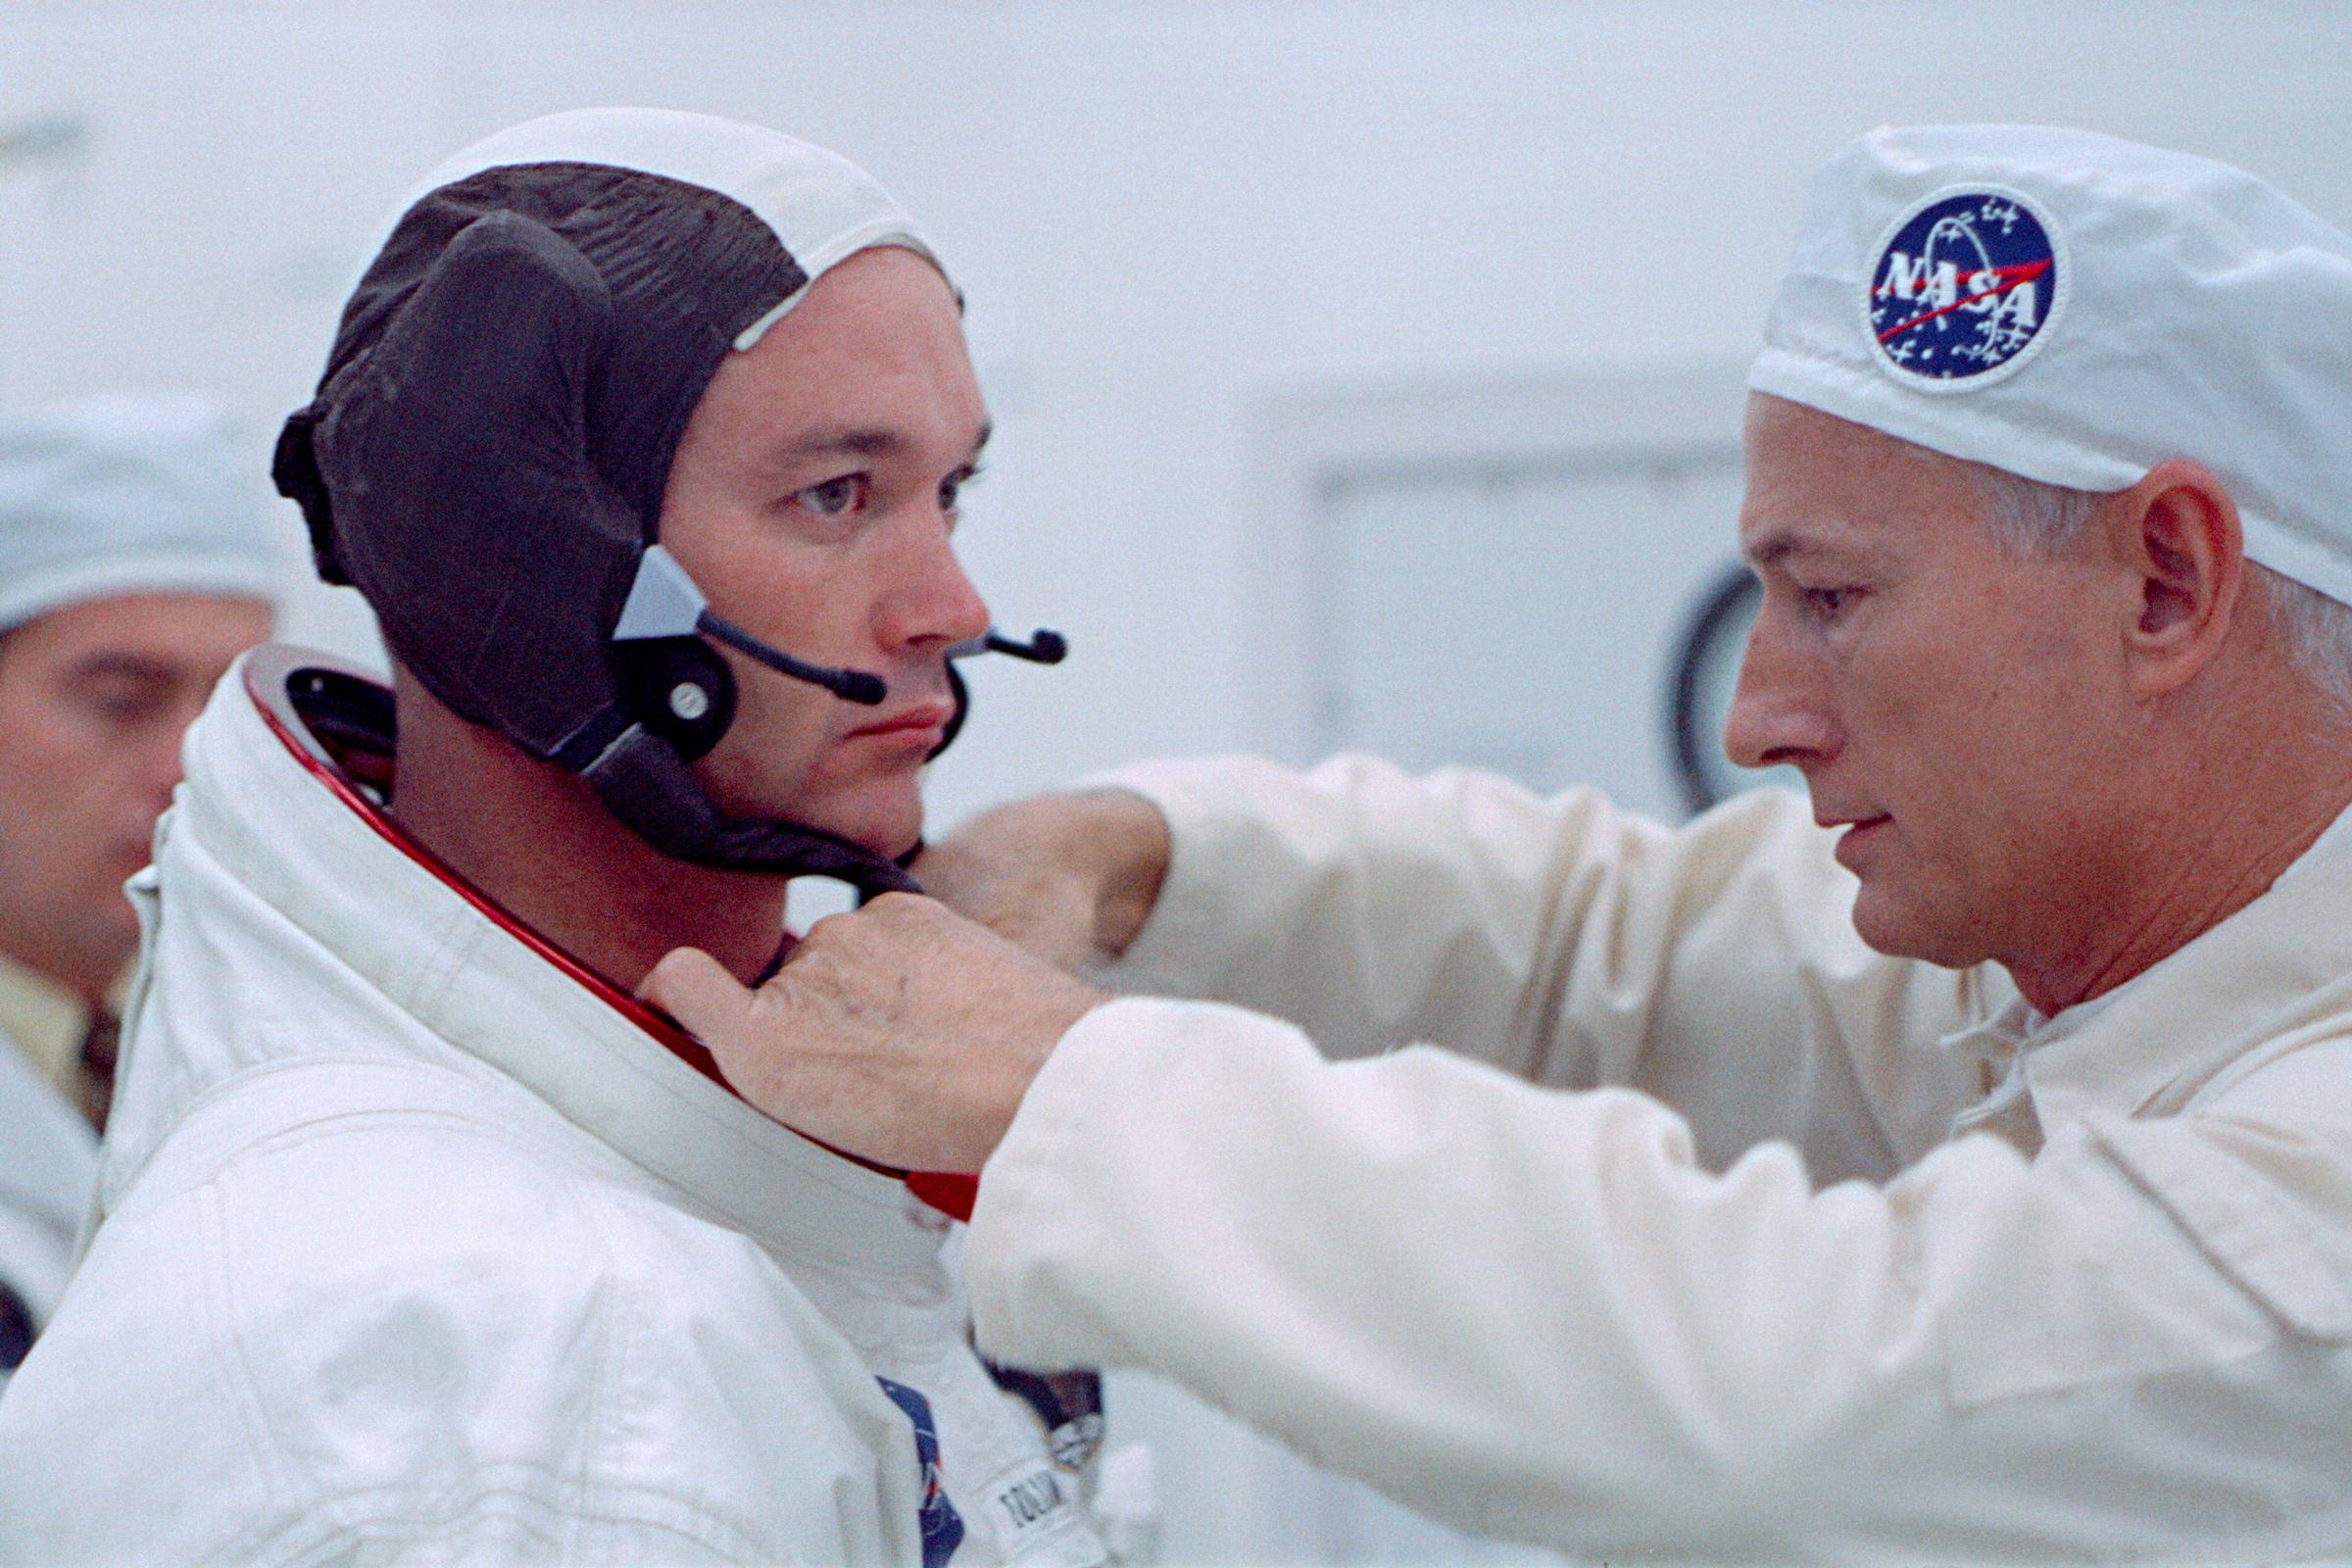 apollo 11 space mission mike - photo #18